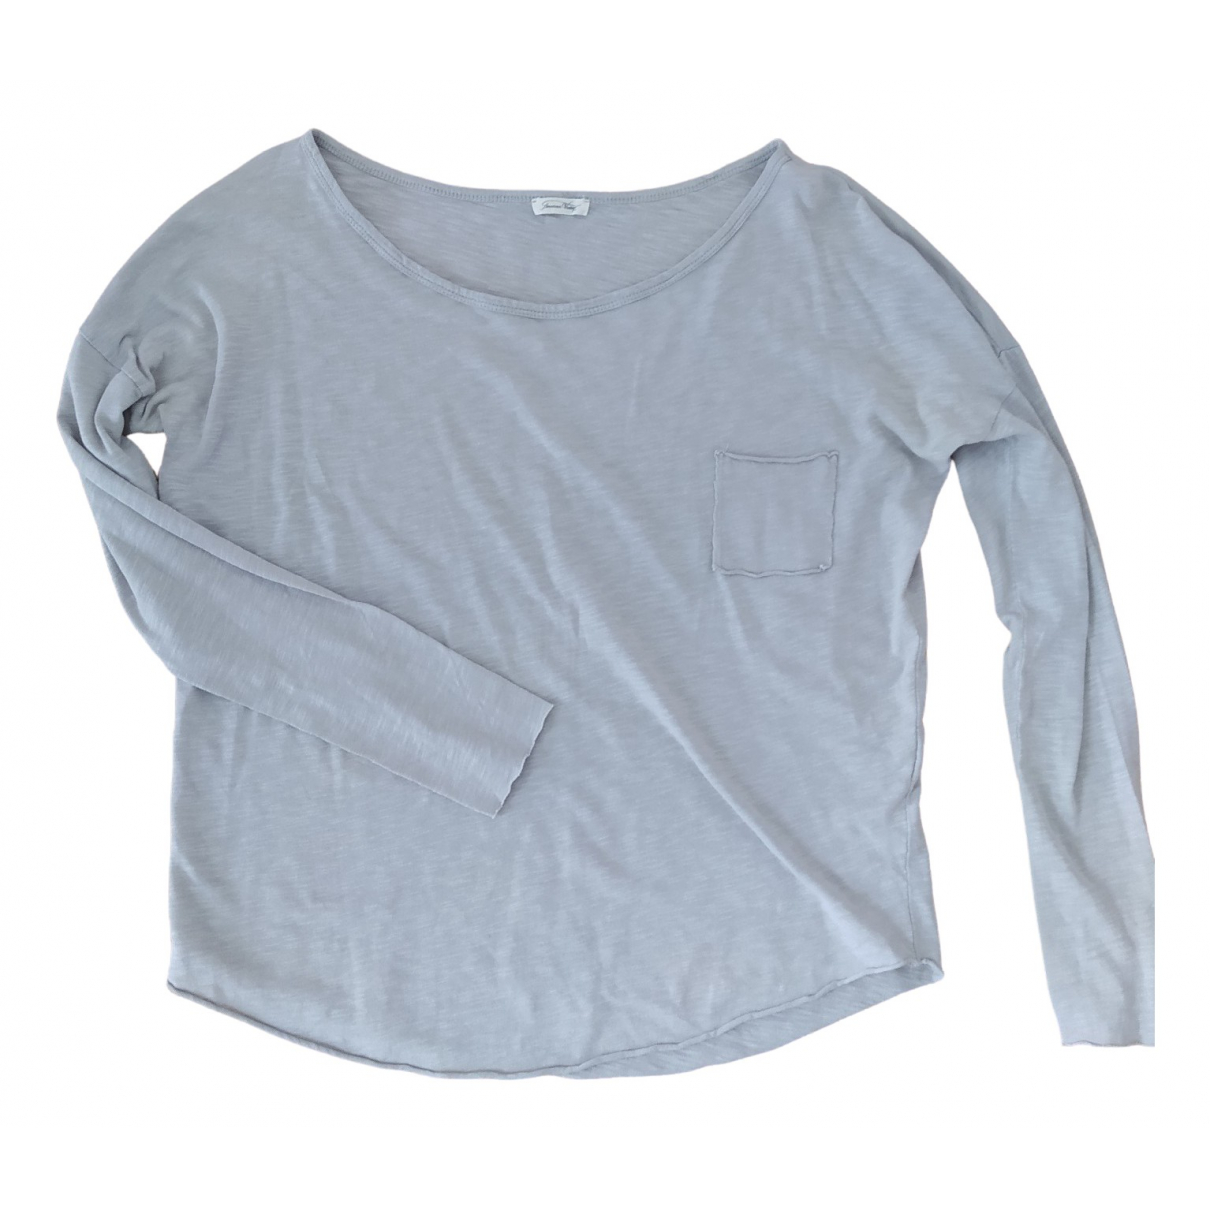 American Vintage \N Grey Cotton  top for Women S International